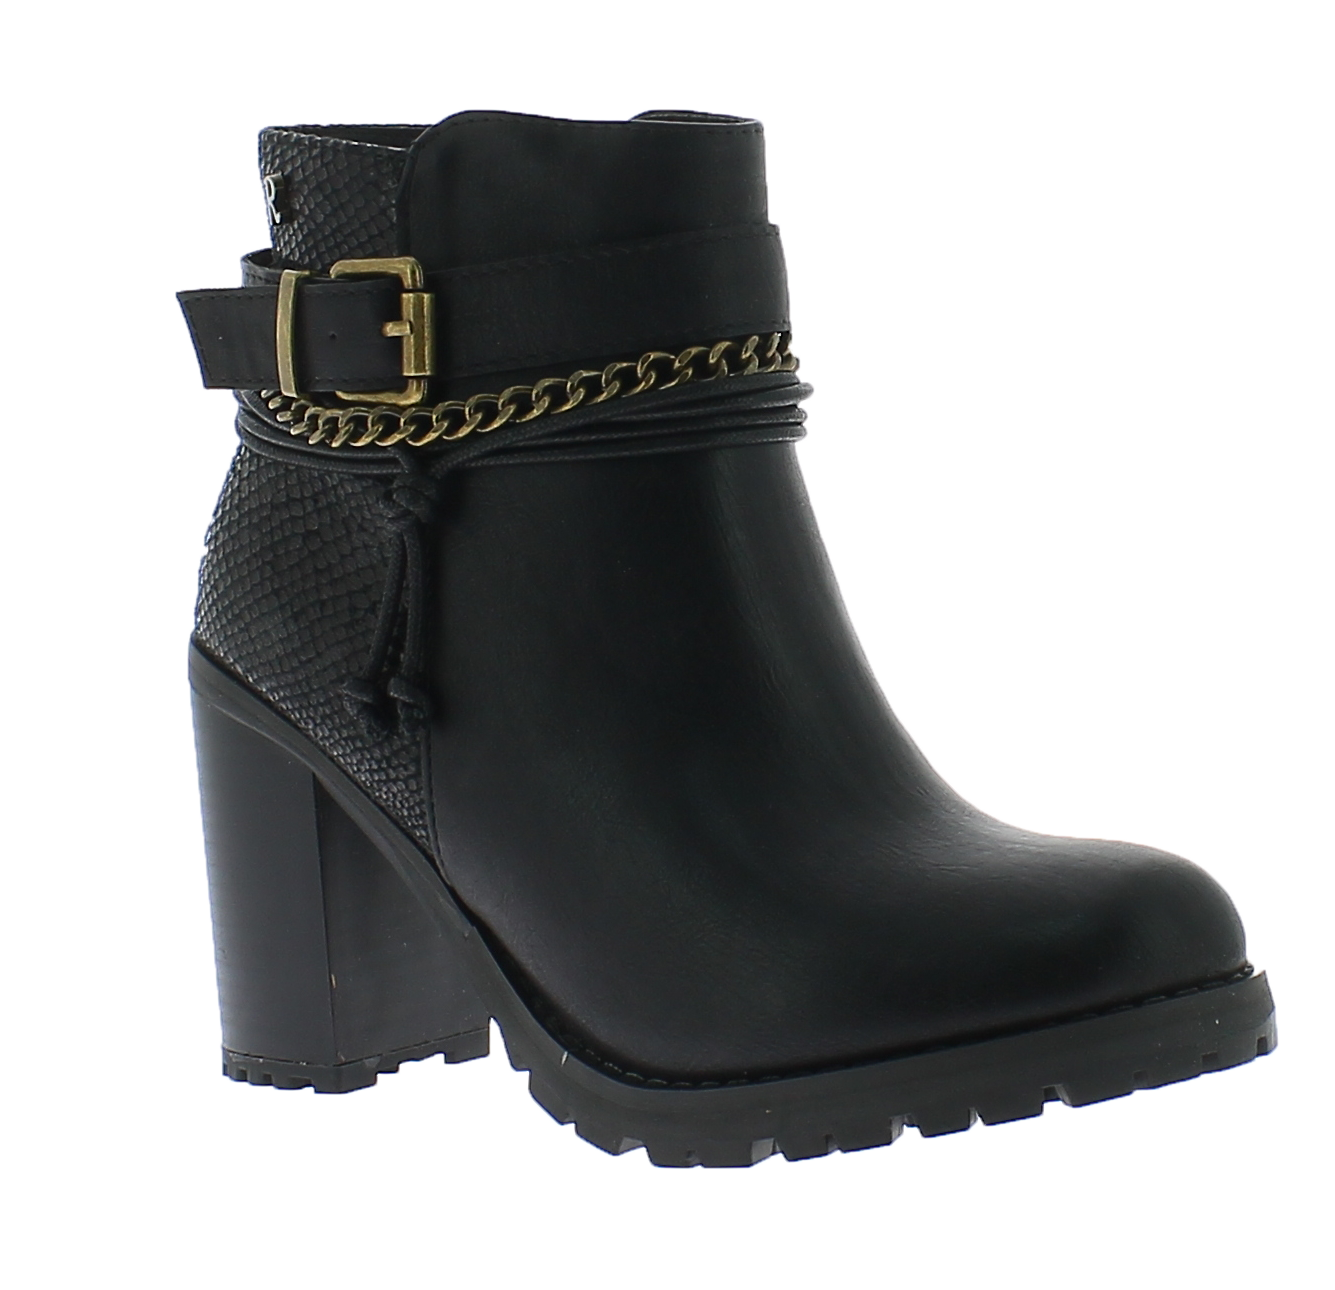 REFRESH Γυναικείο Μποτάκι 63132 Μαύρο - IqShoes - 63132 BLACK-black-36/1/15/7 παπούτσια  γυναικεία μποτάκια